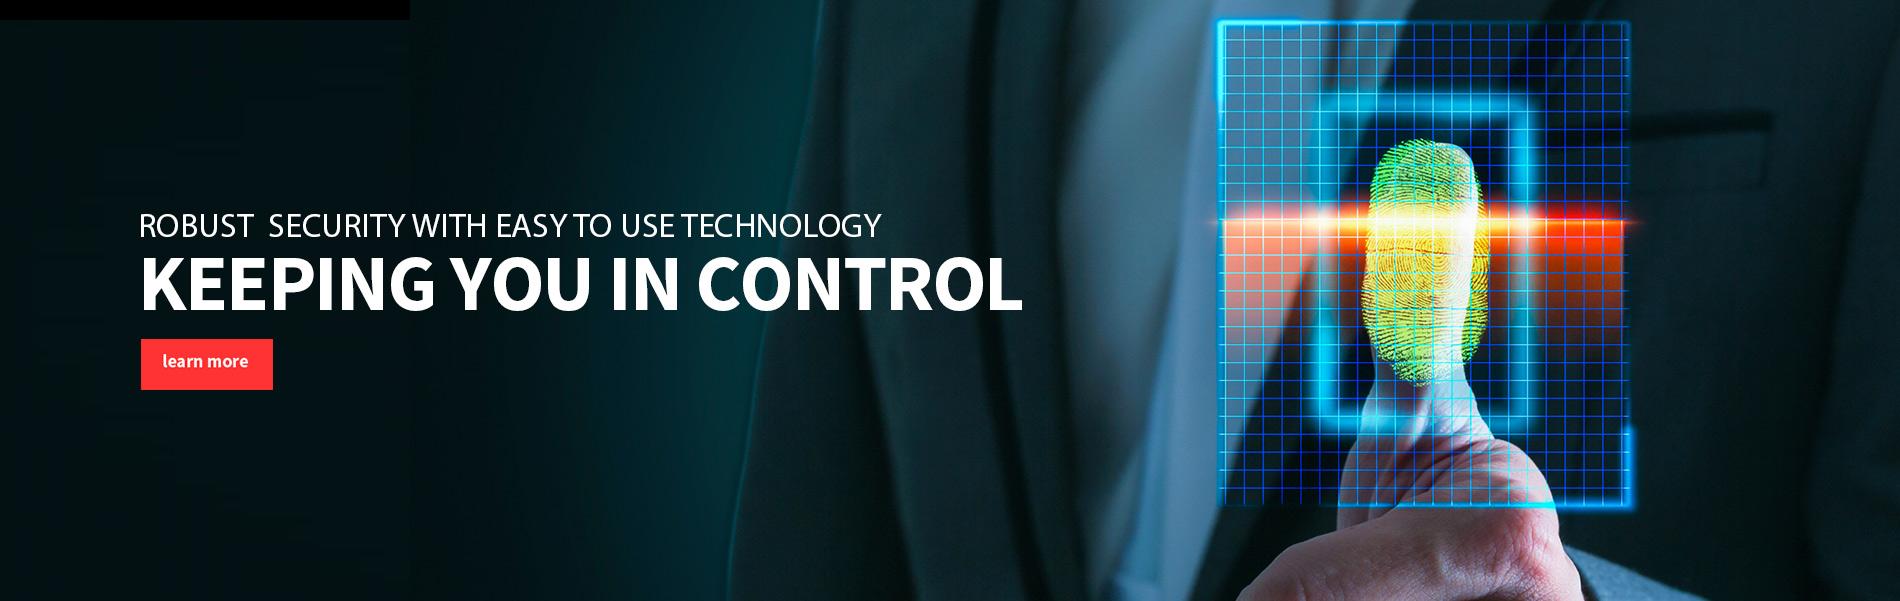 access-control-banner-update-2